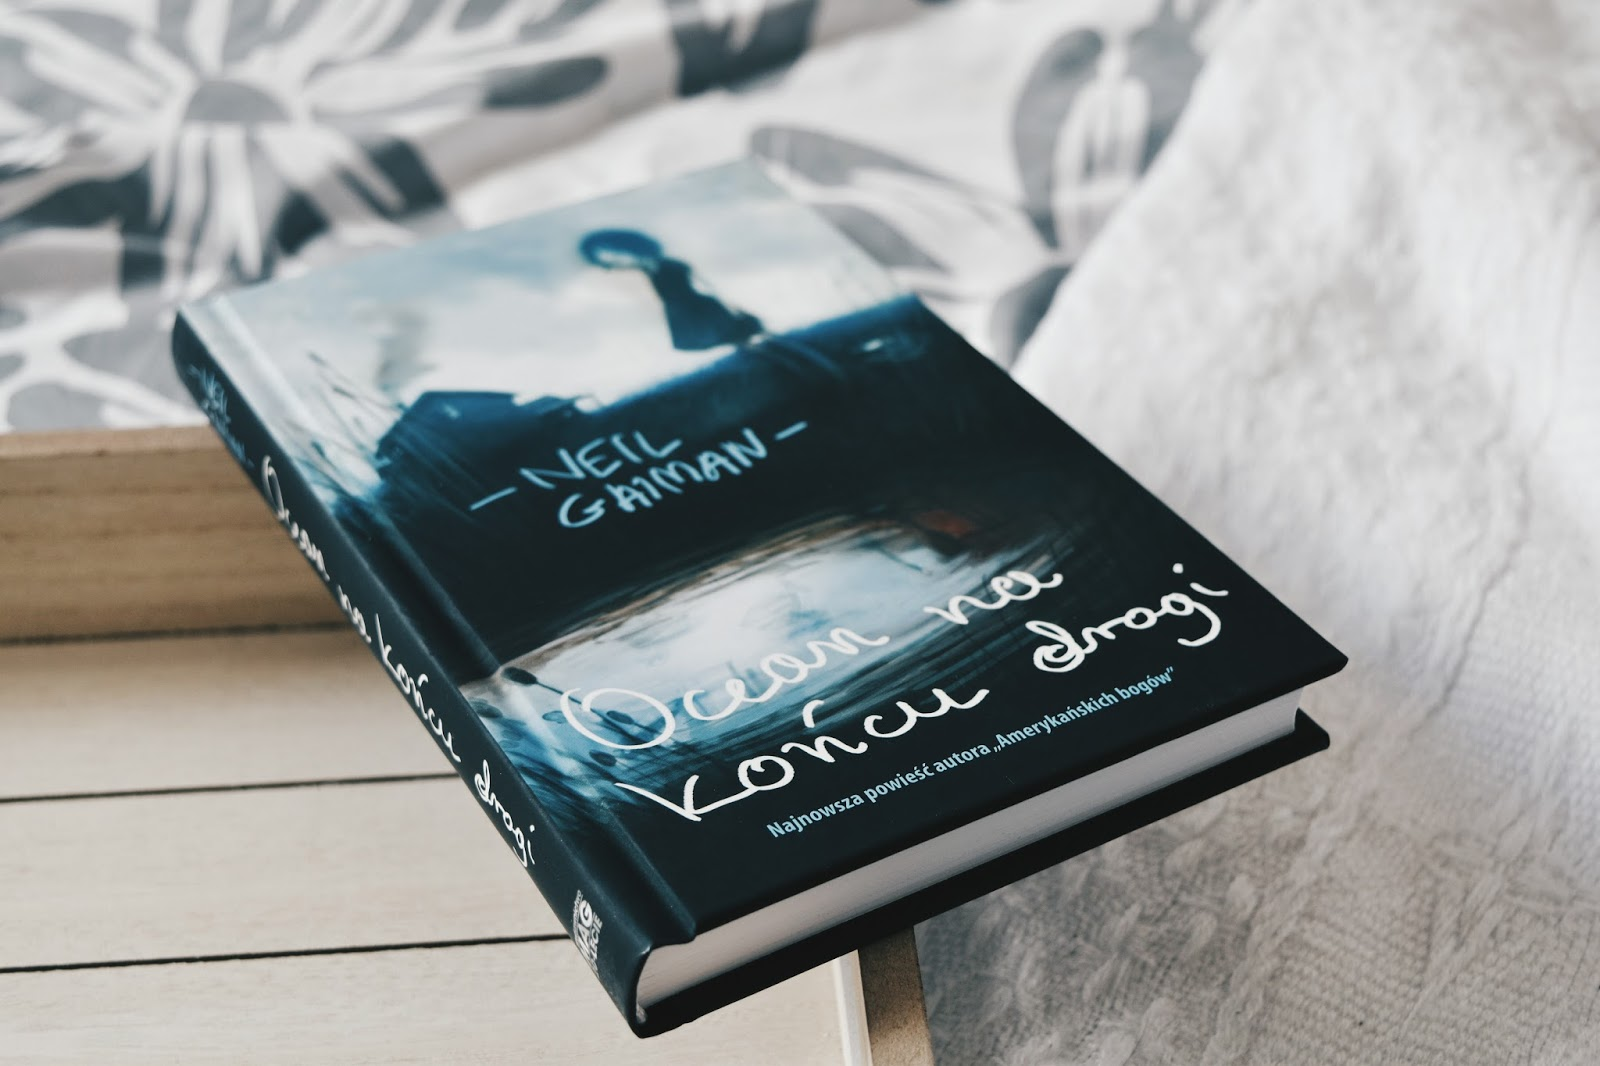 Neil Gaiman, Ocean na końcu drogi, książka, otwarta książka, recenzja, warto kupić, tania książka